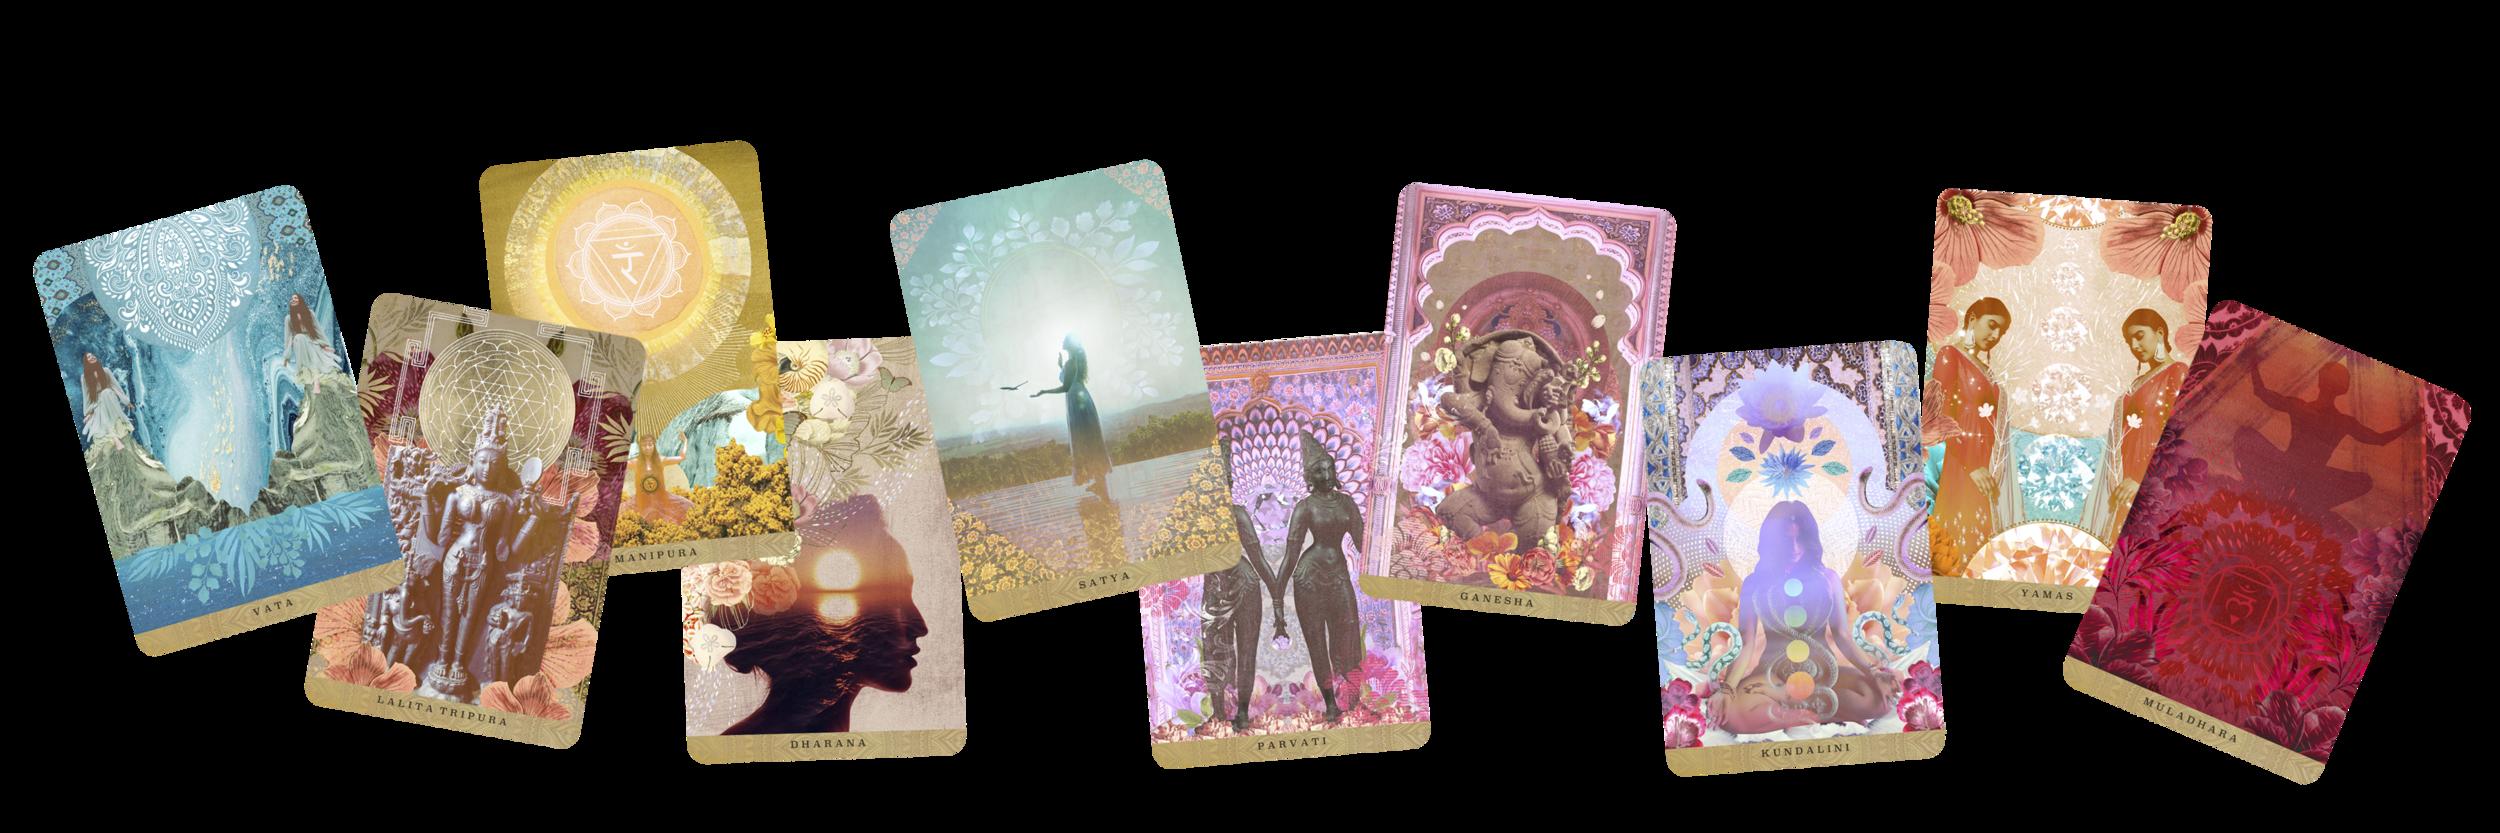 yogic-cards-2.png